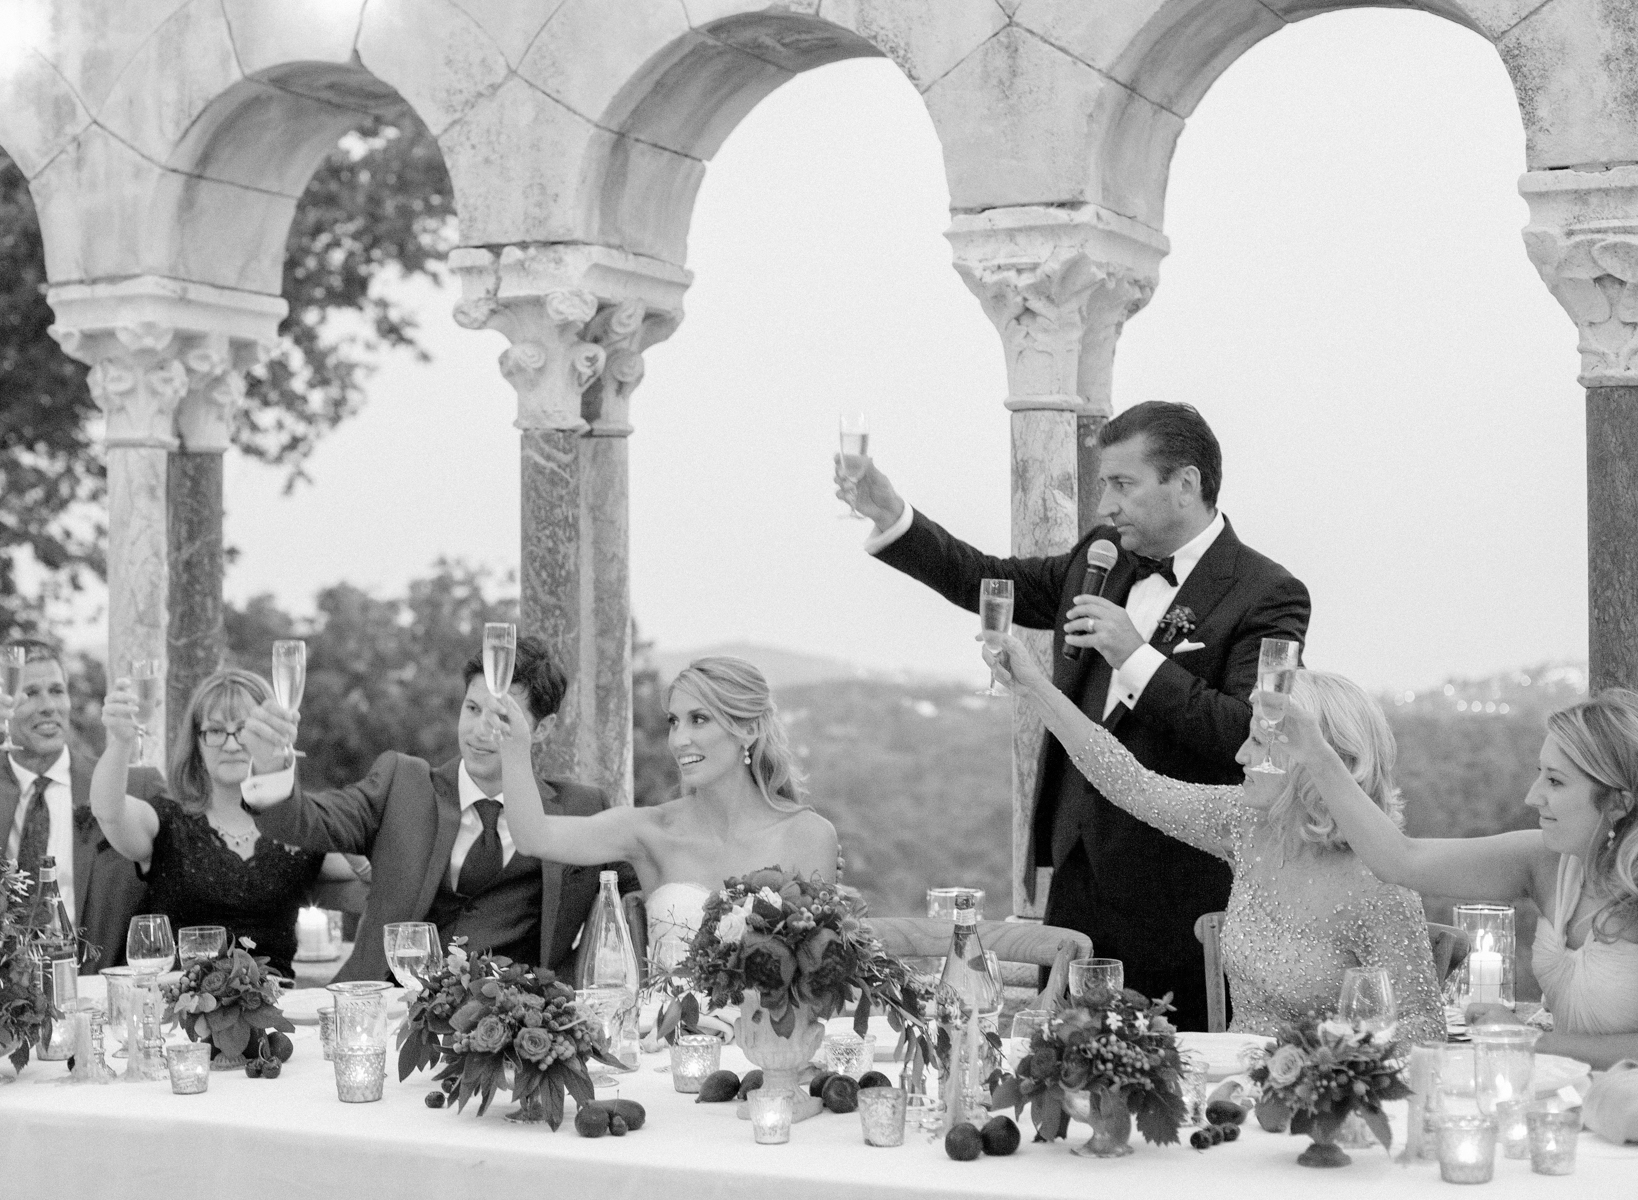 French_Wedding_(c)_Rory_Wylie-4.jpg